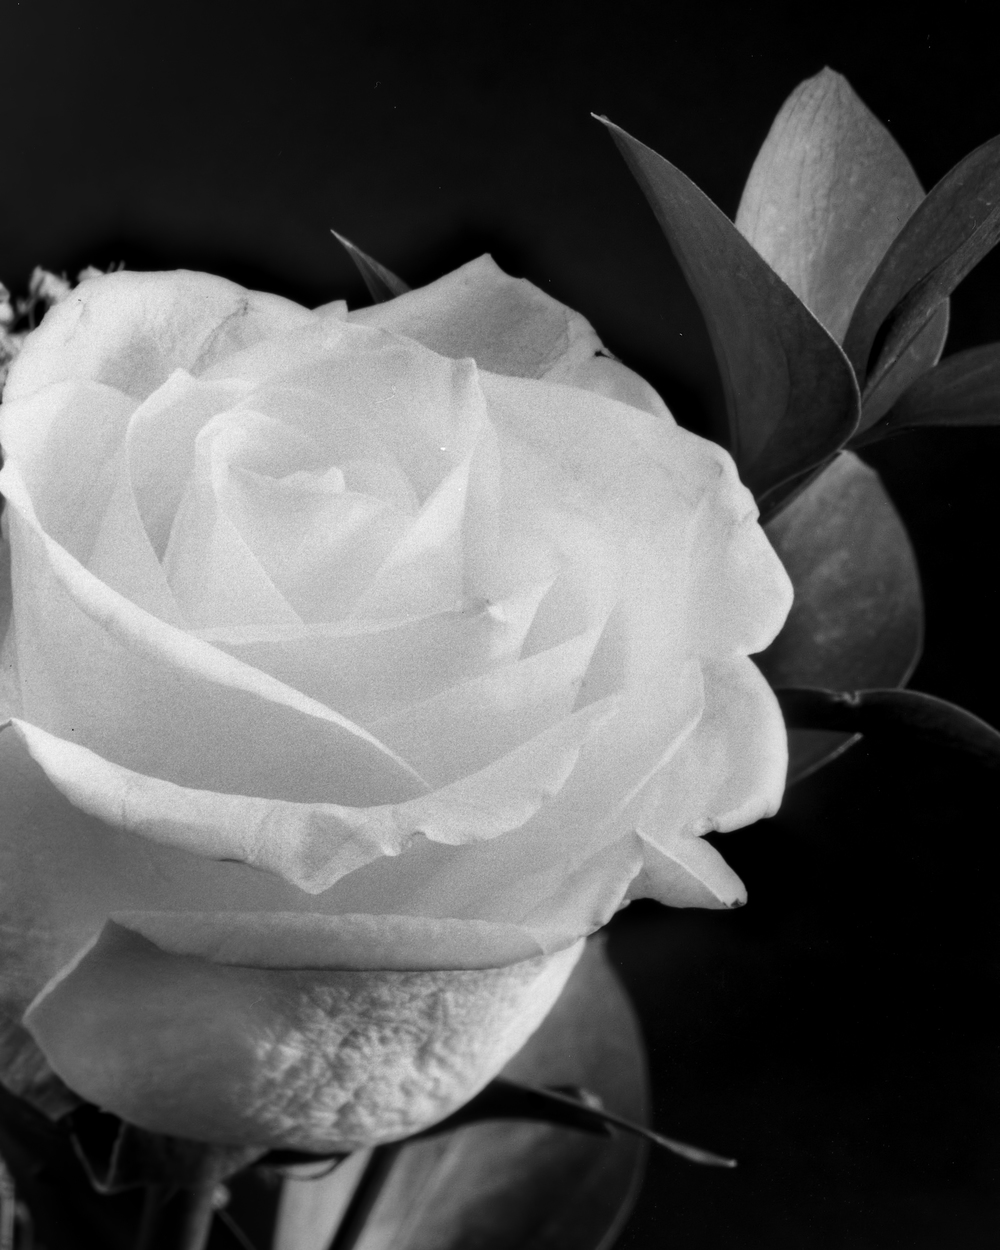 2013-08-20_lf4x5_white_rose.jpg